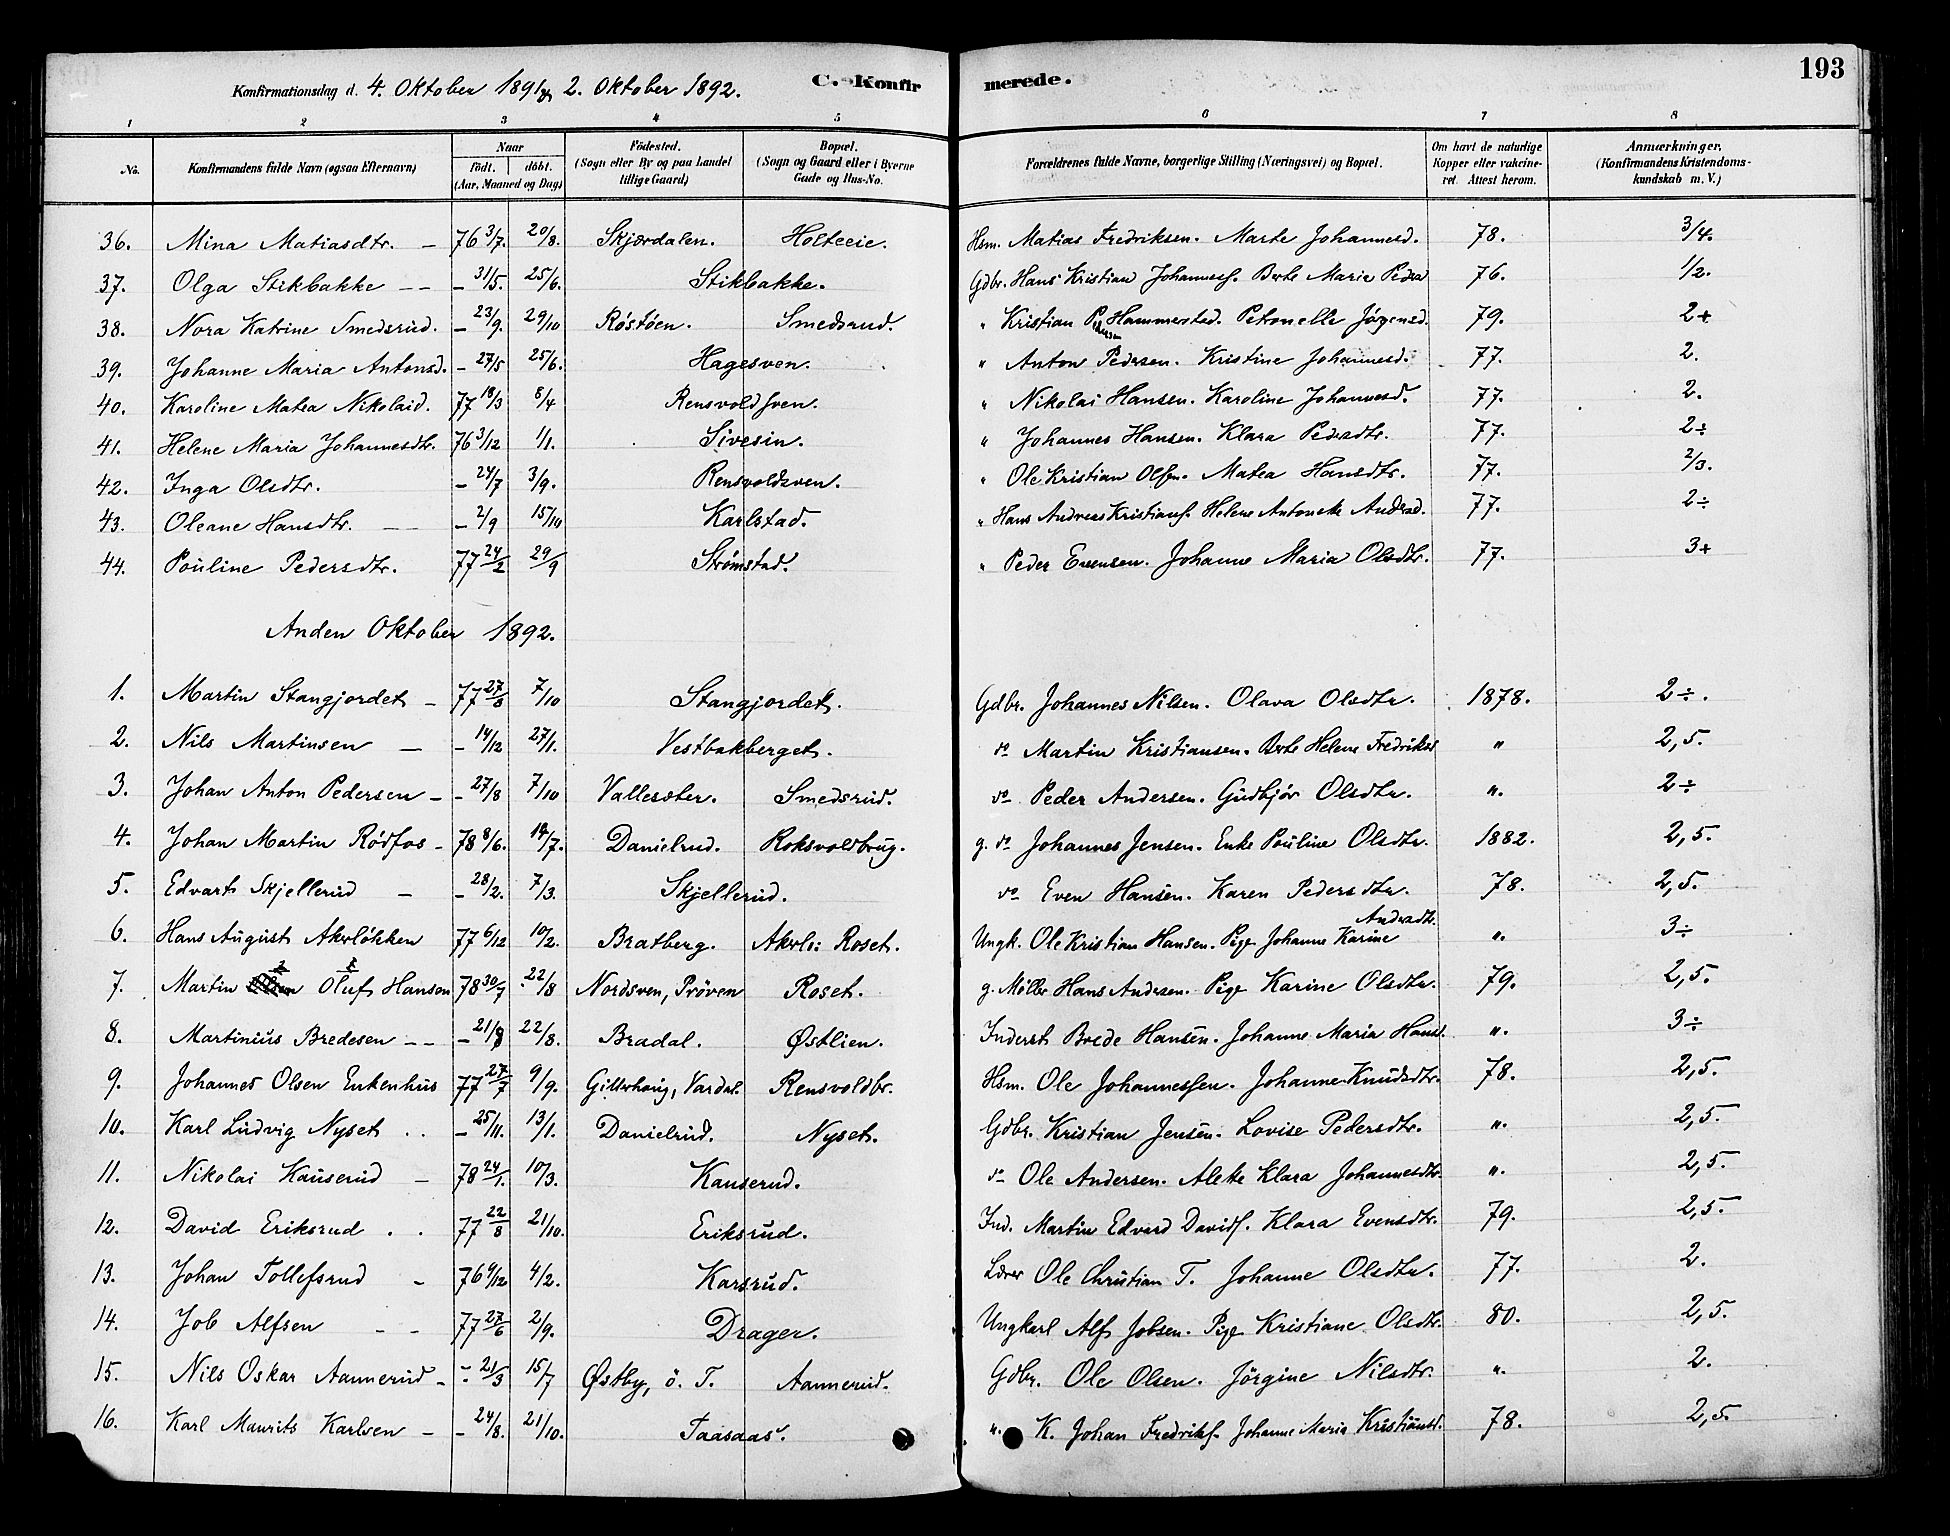 SAH, Vestre Toten prestekontor, H/Ha/Haa/L0009: Ministerialbok nr. 9, 1878-1894, s. 193